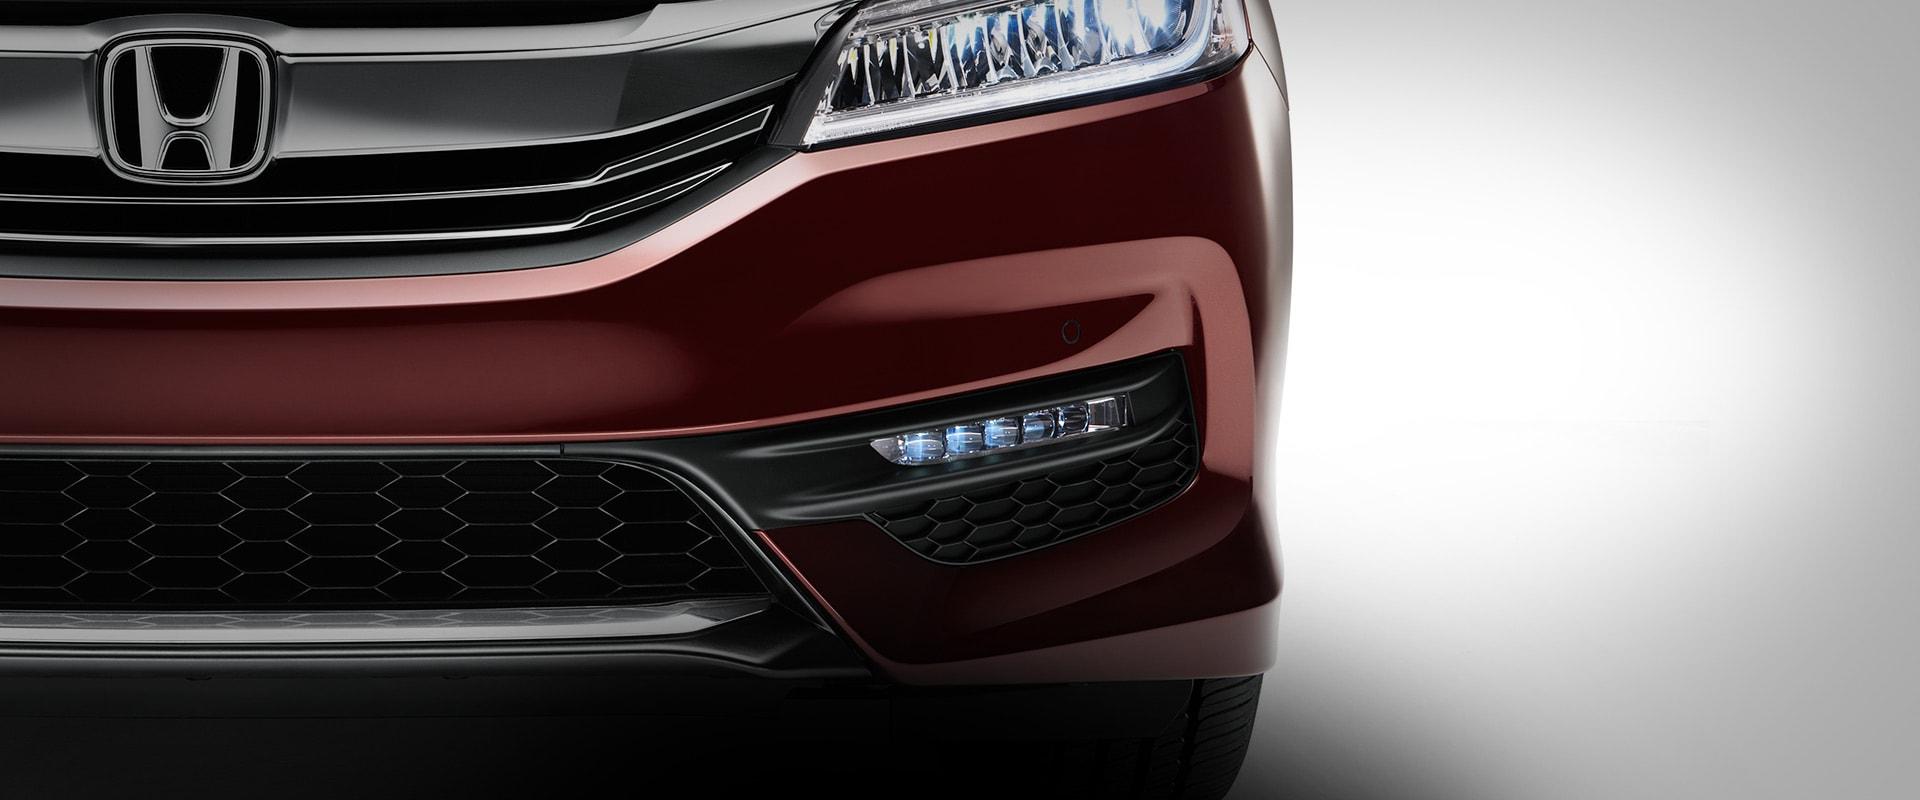 2016 honda accord sedan   features details   official site